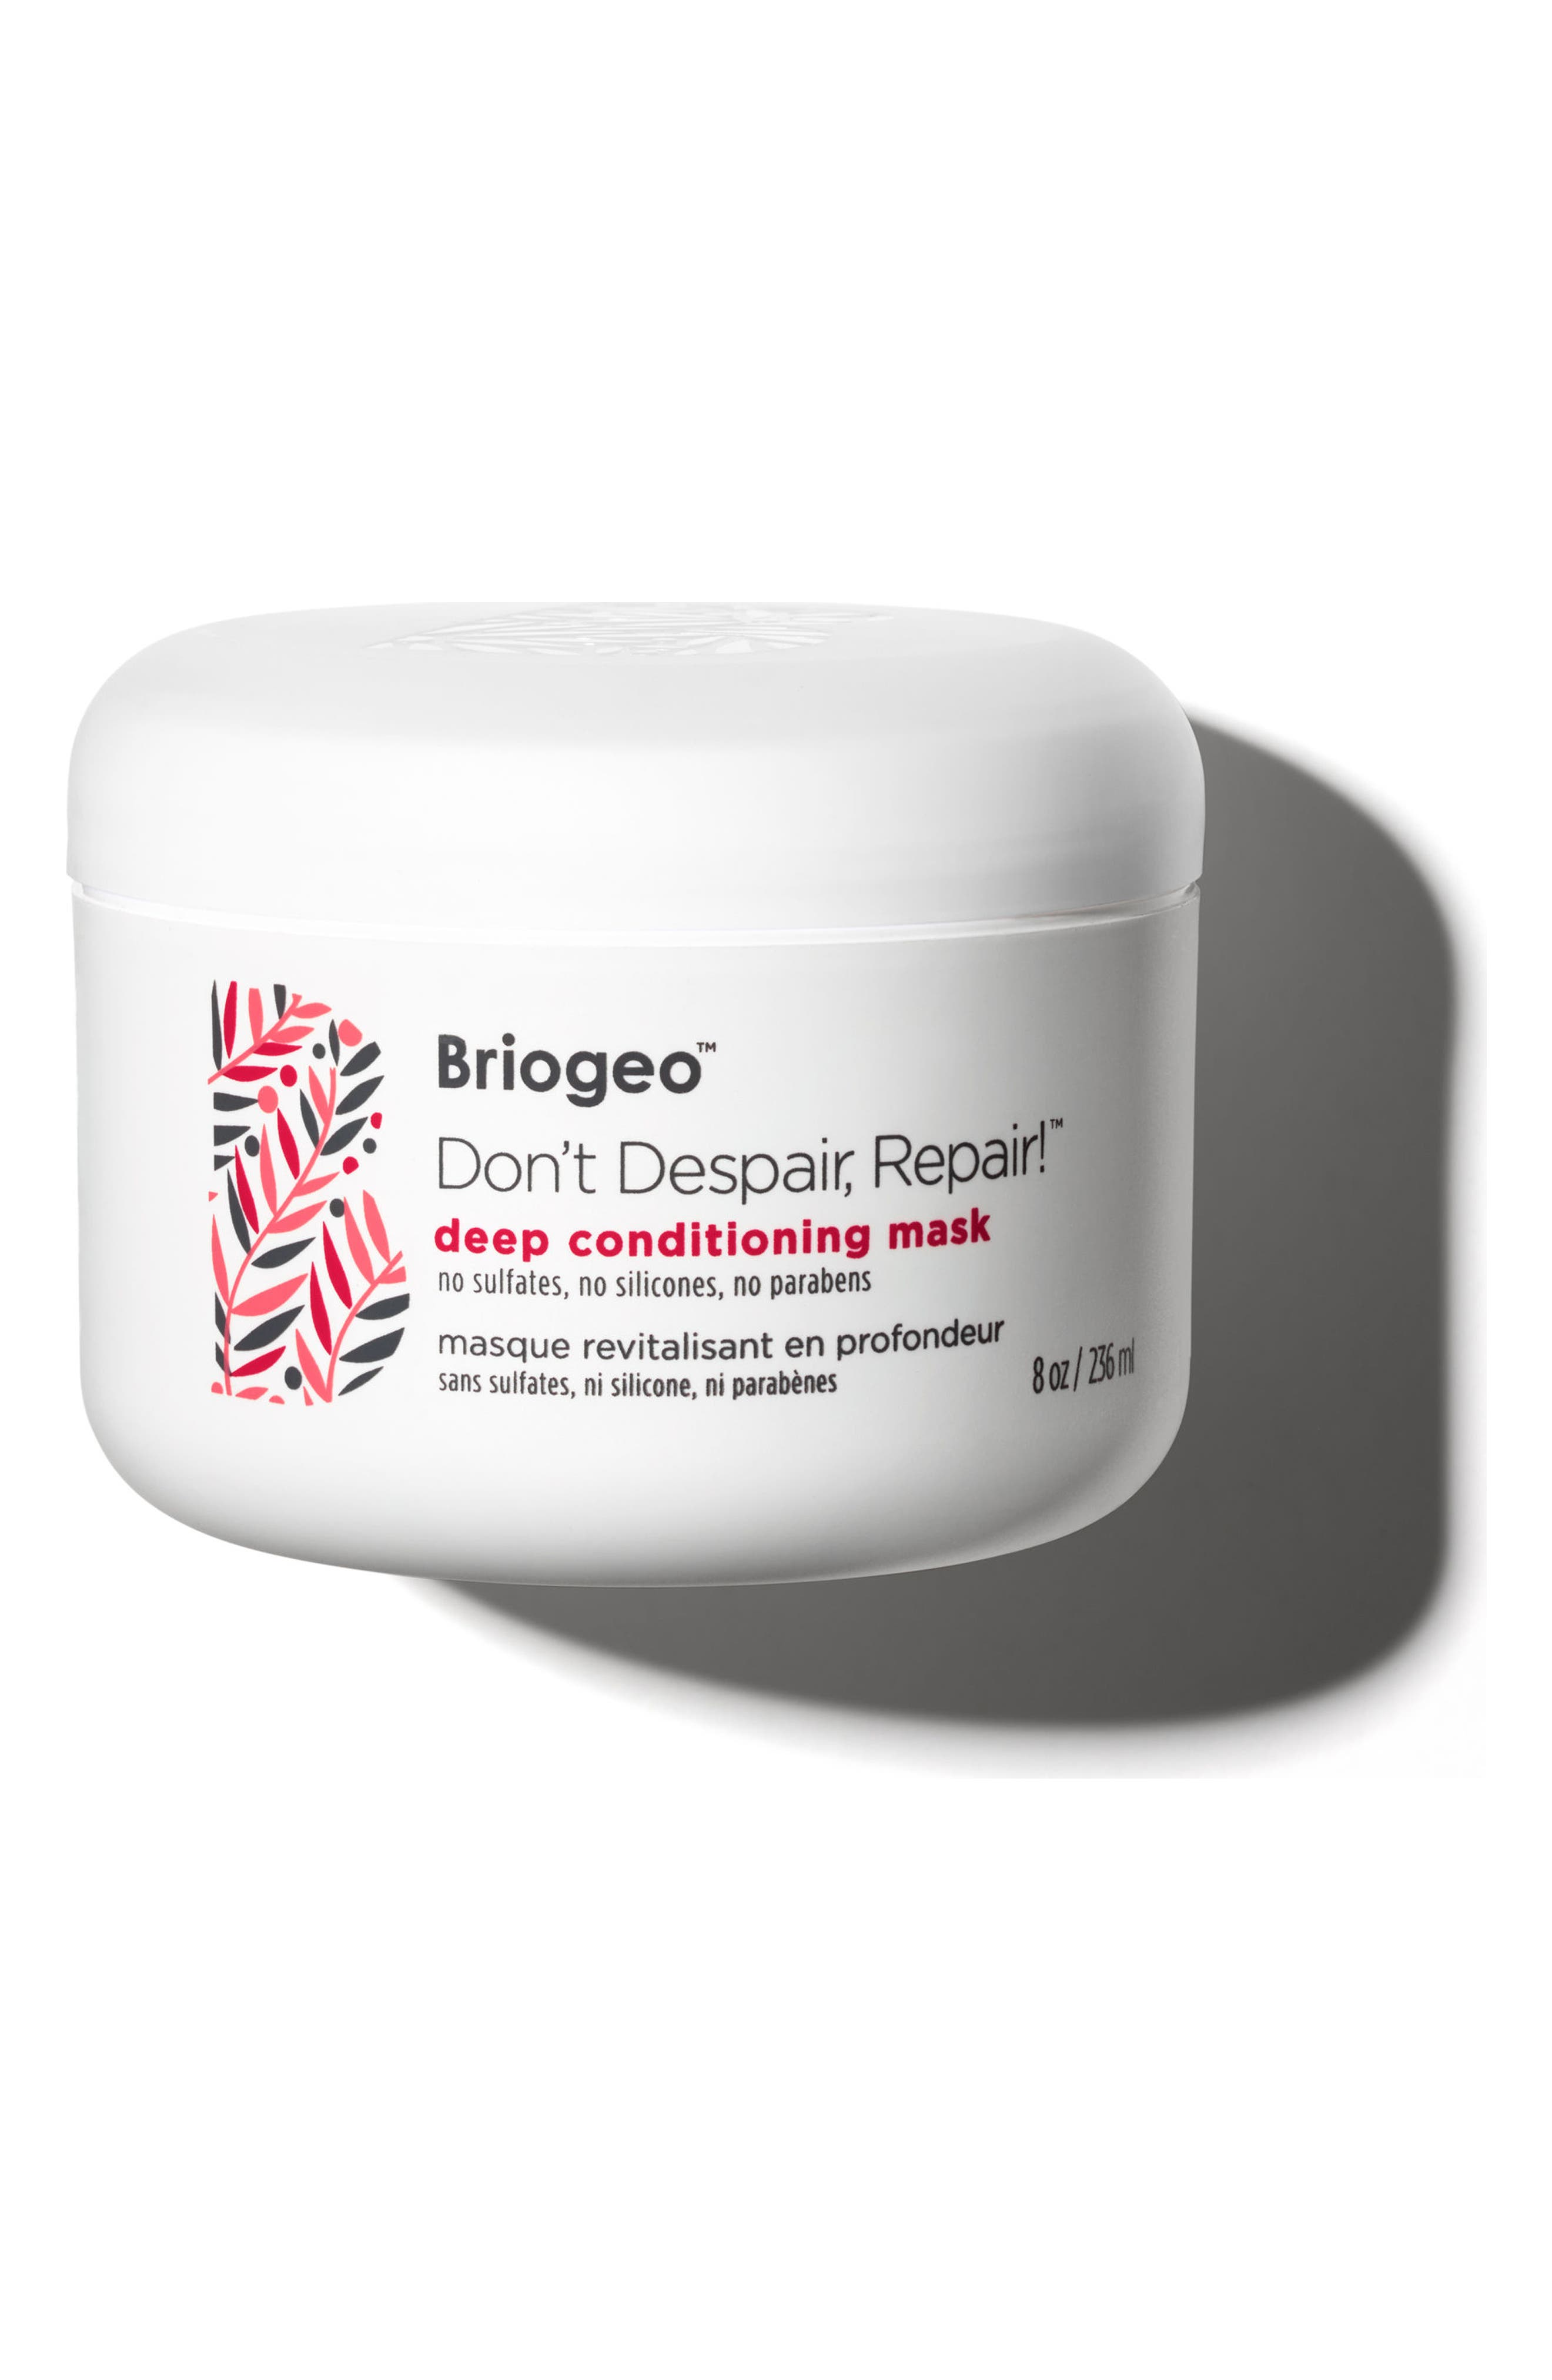 Don't Despair, Repair! Deep Conditioning Mask,                             Main thumbnail 1, color,                             NO COLOR